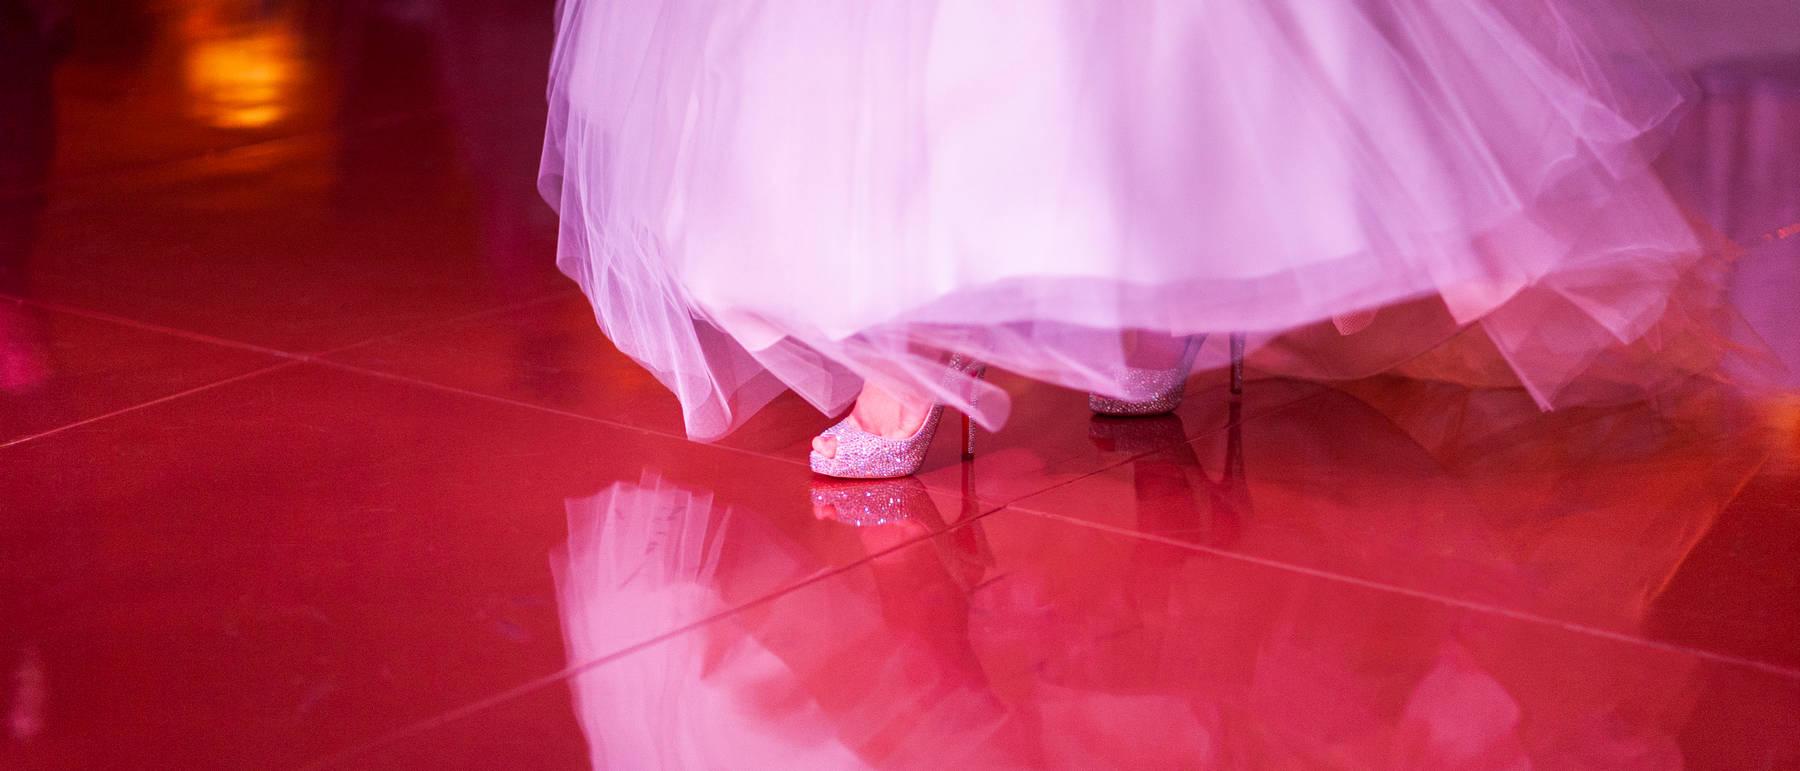 johnandjoseph-wedding-photographer-hz-slider-380